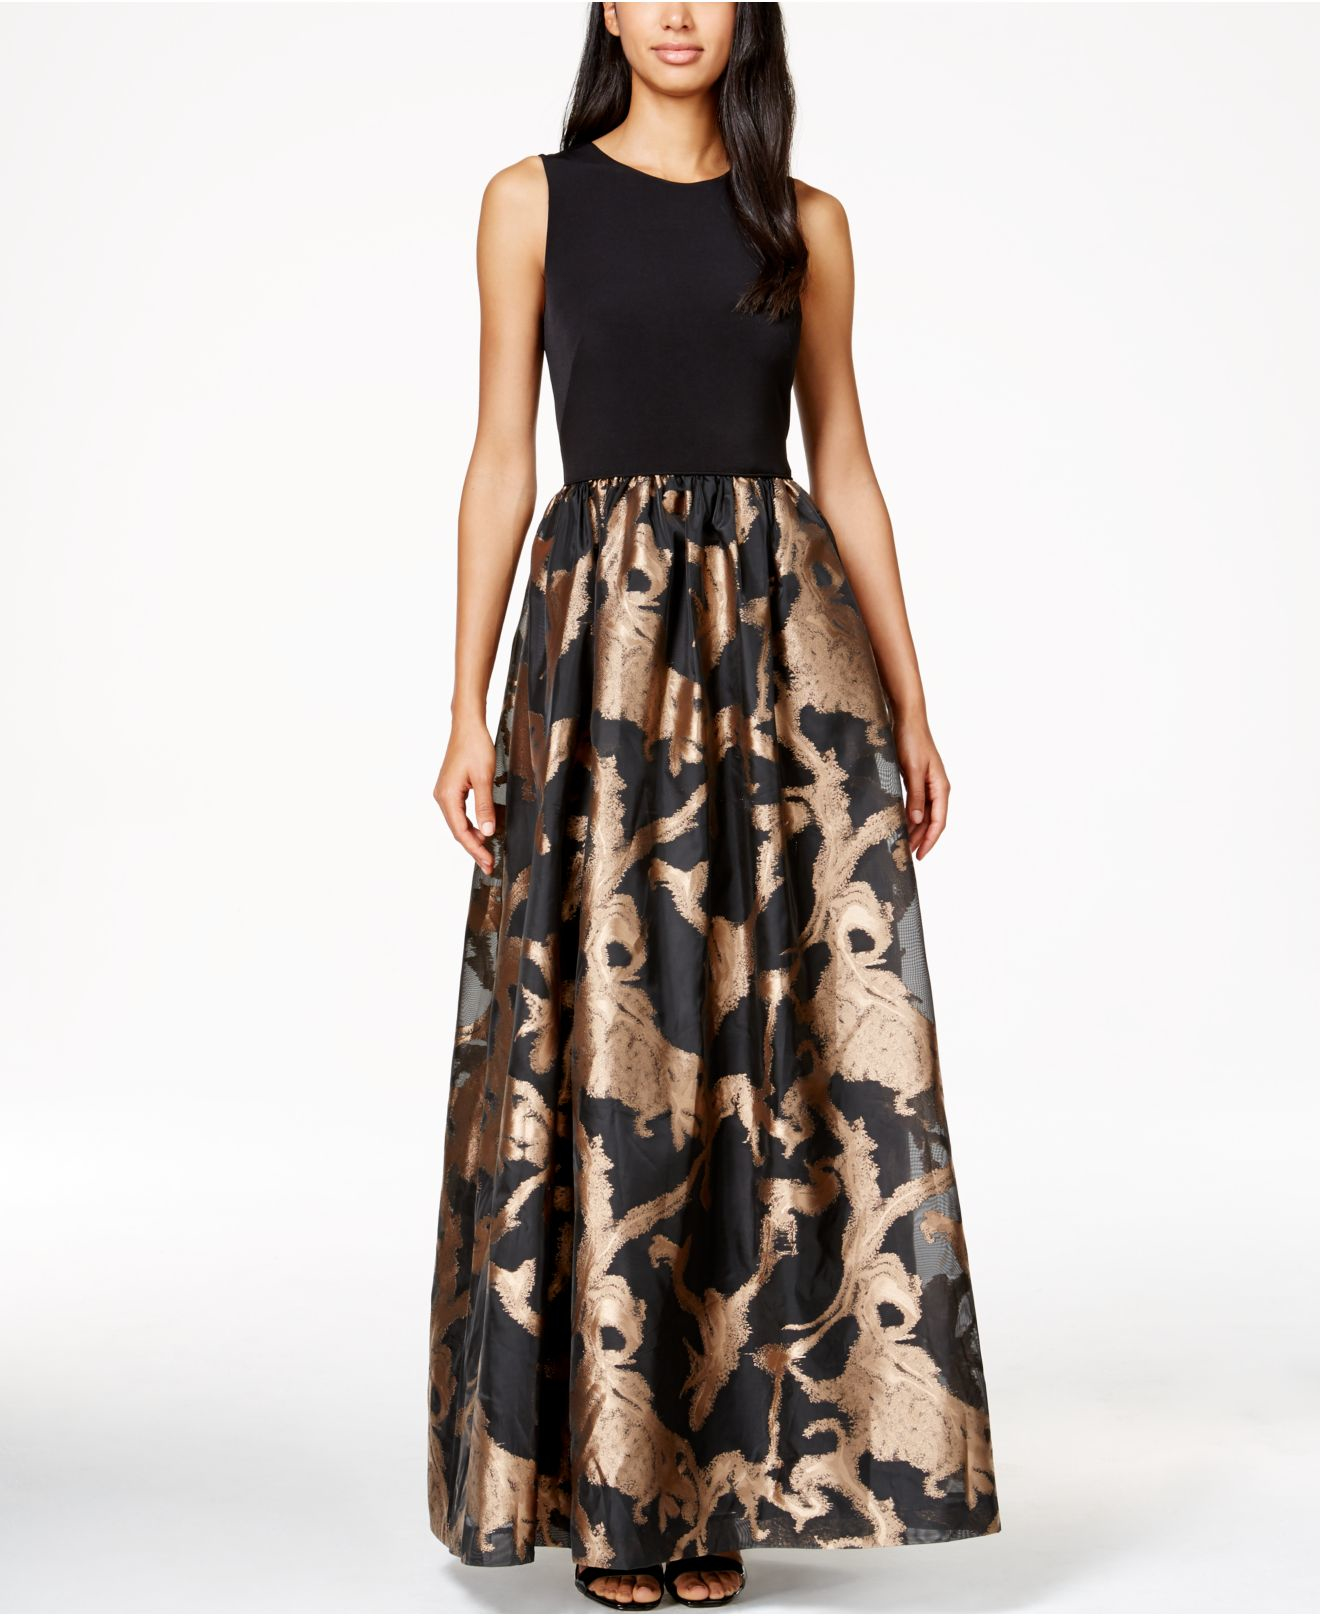 Lyst - Calvin Klein Metallic Taffeta Gown in Black